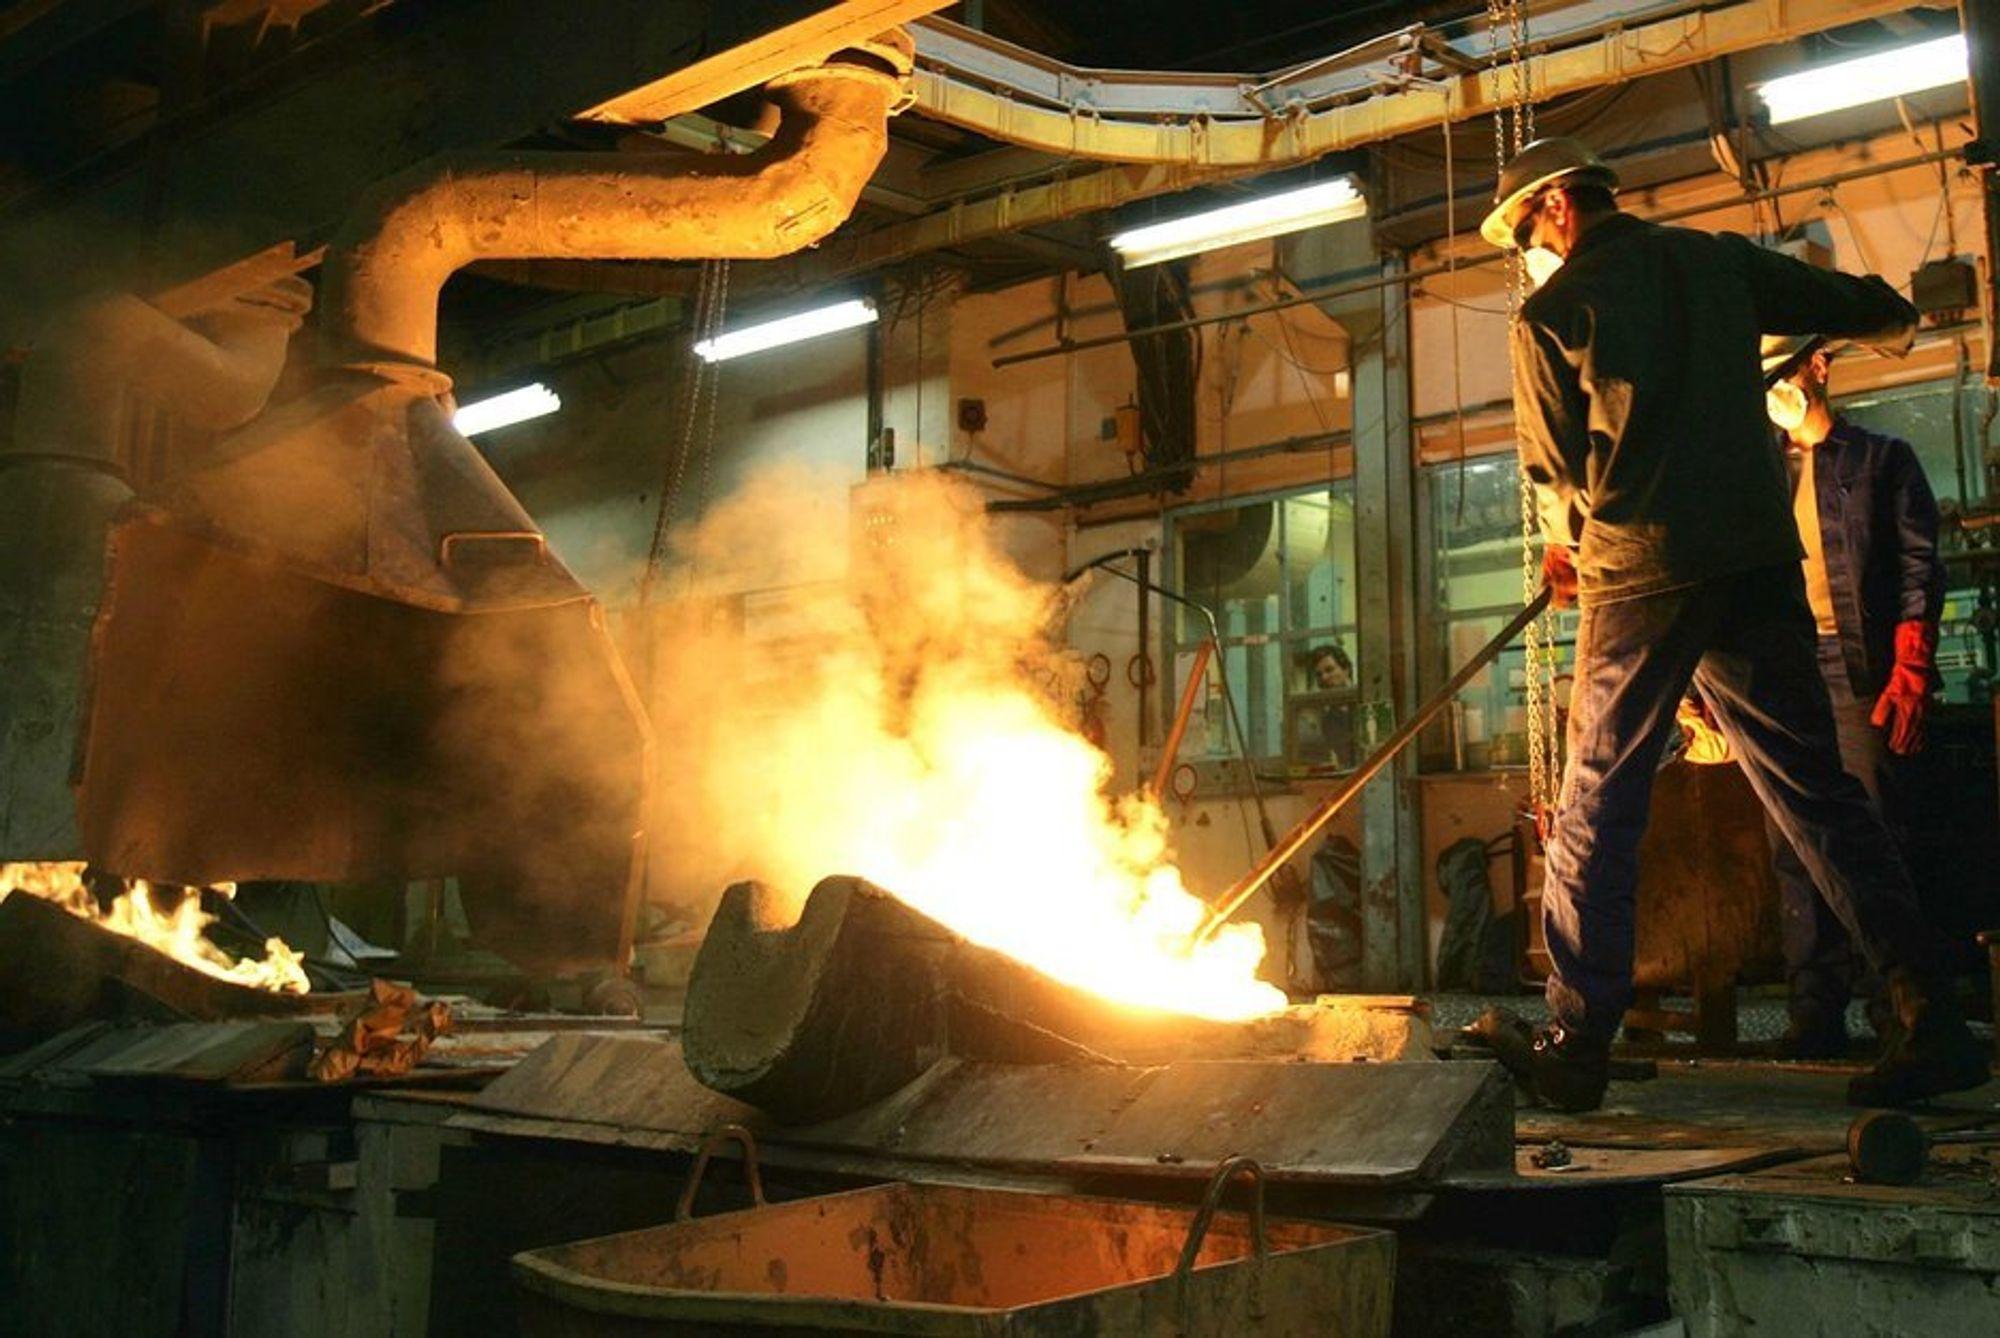 Industri, industriarbeider, smelteverk